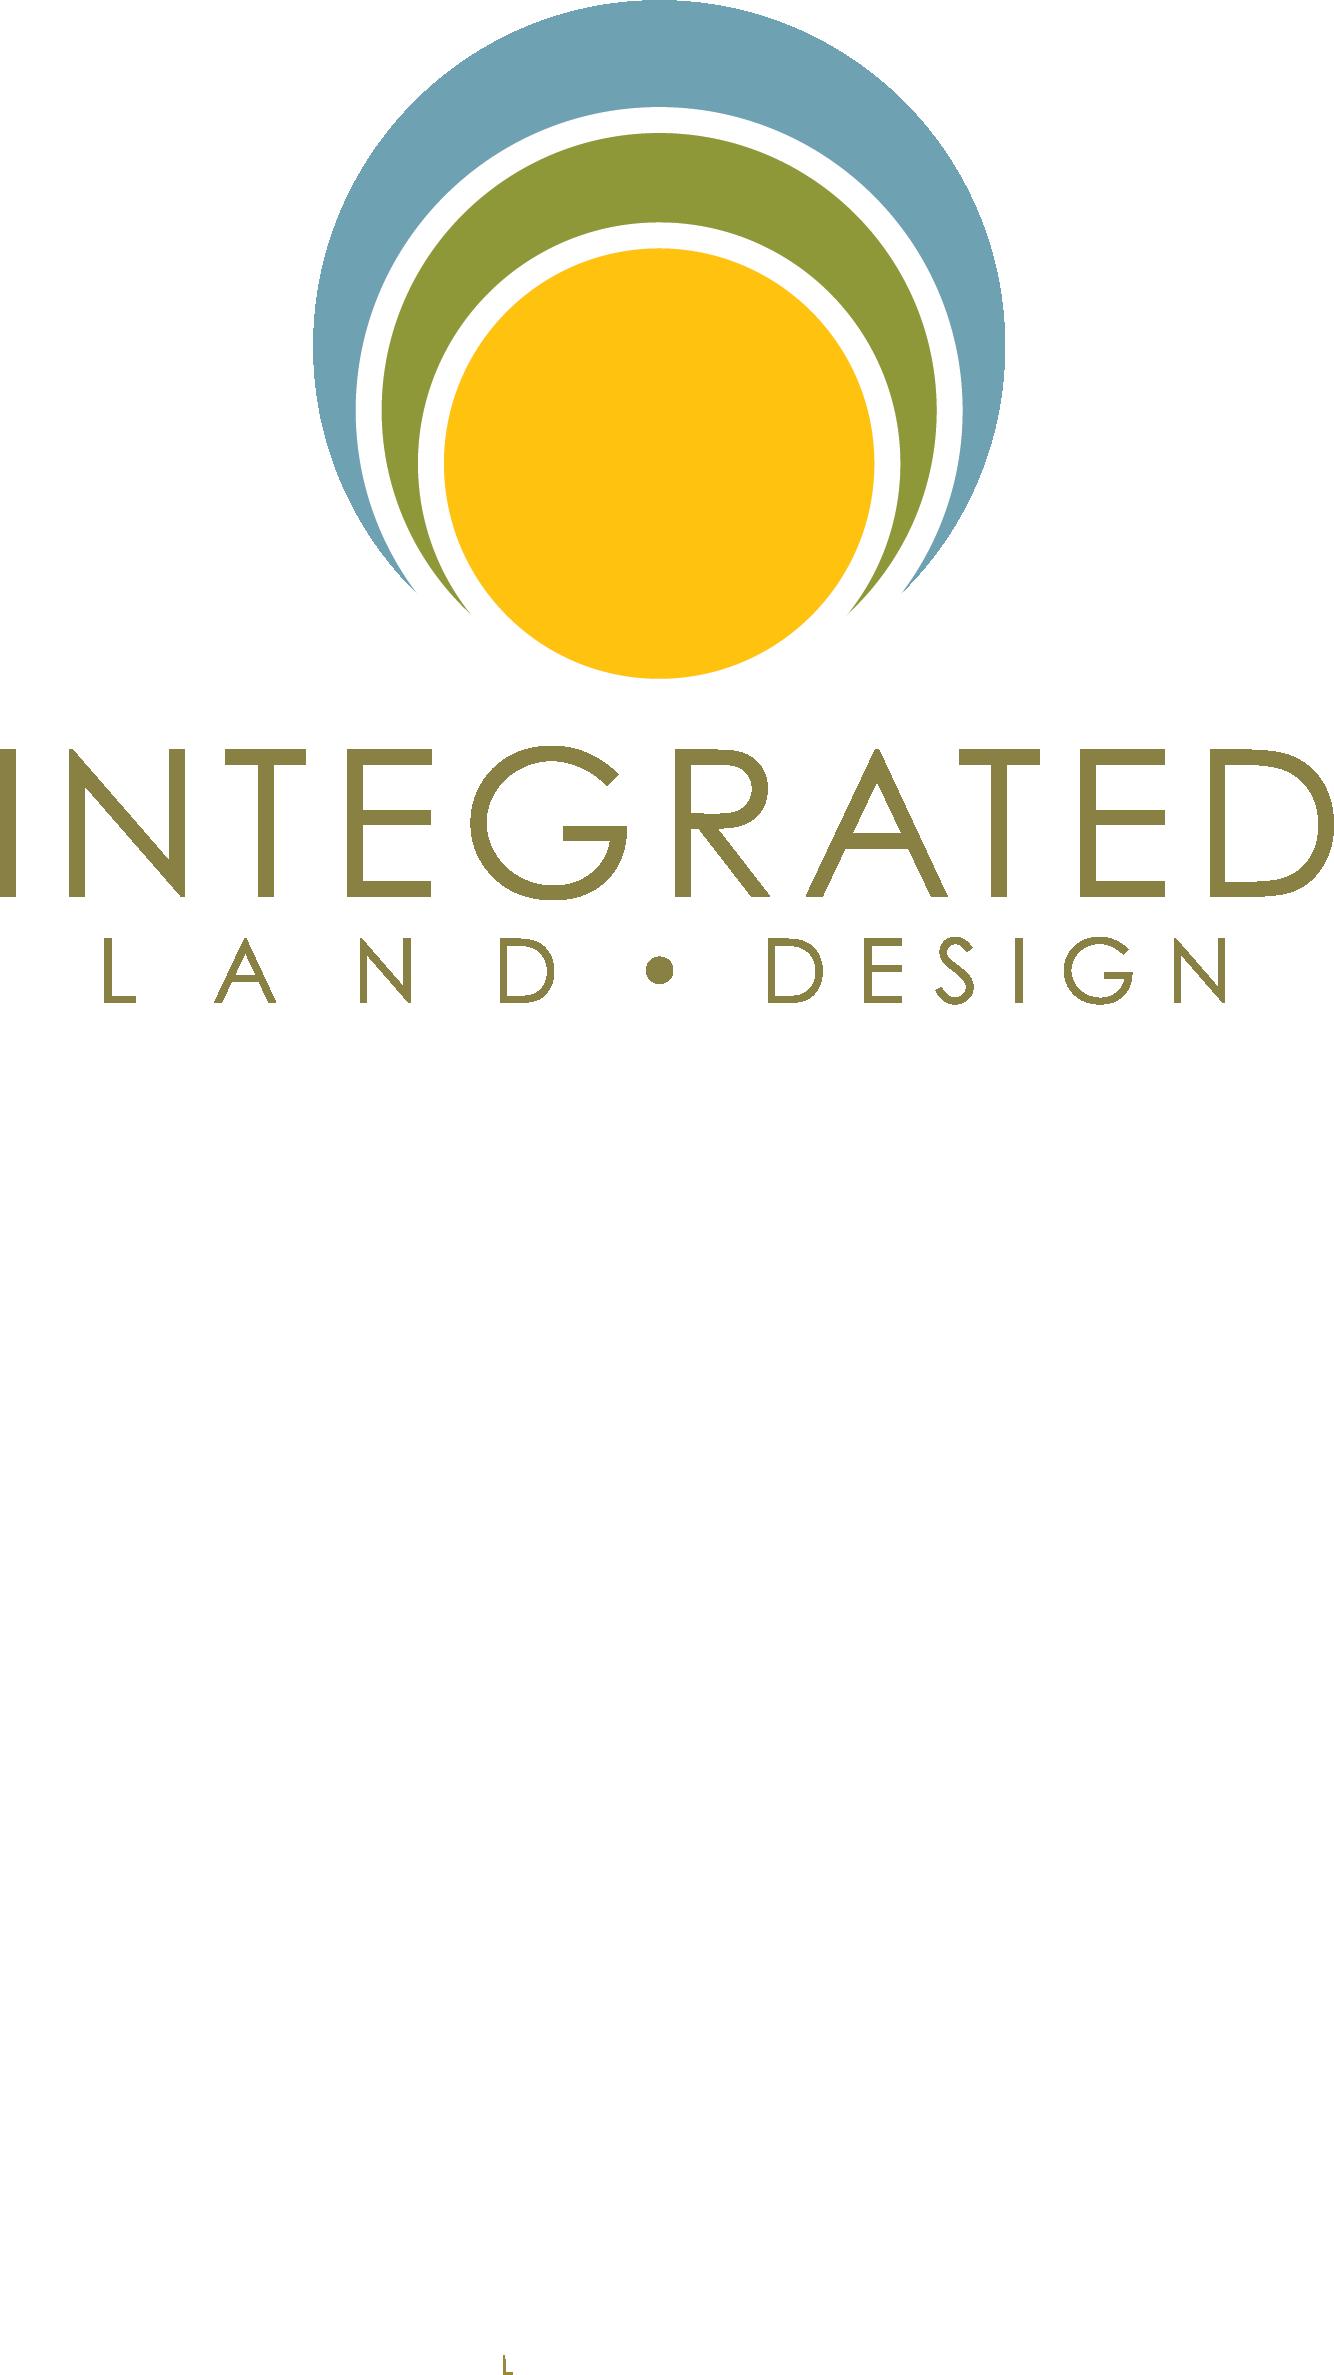 Integrated Land Design